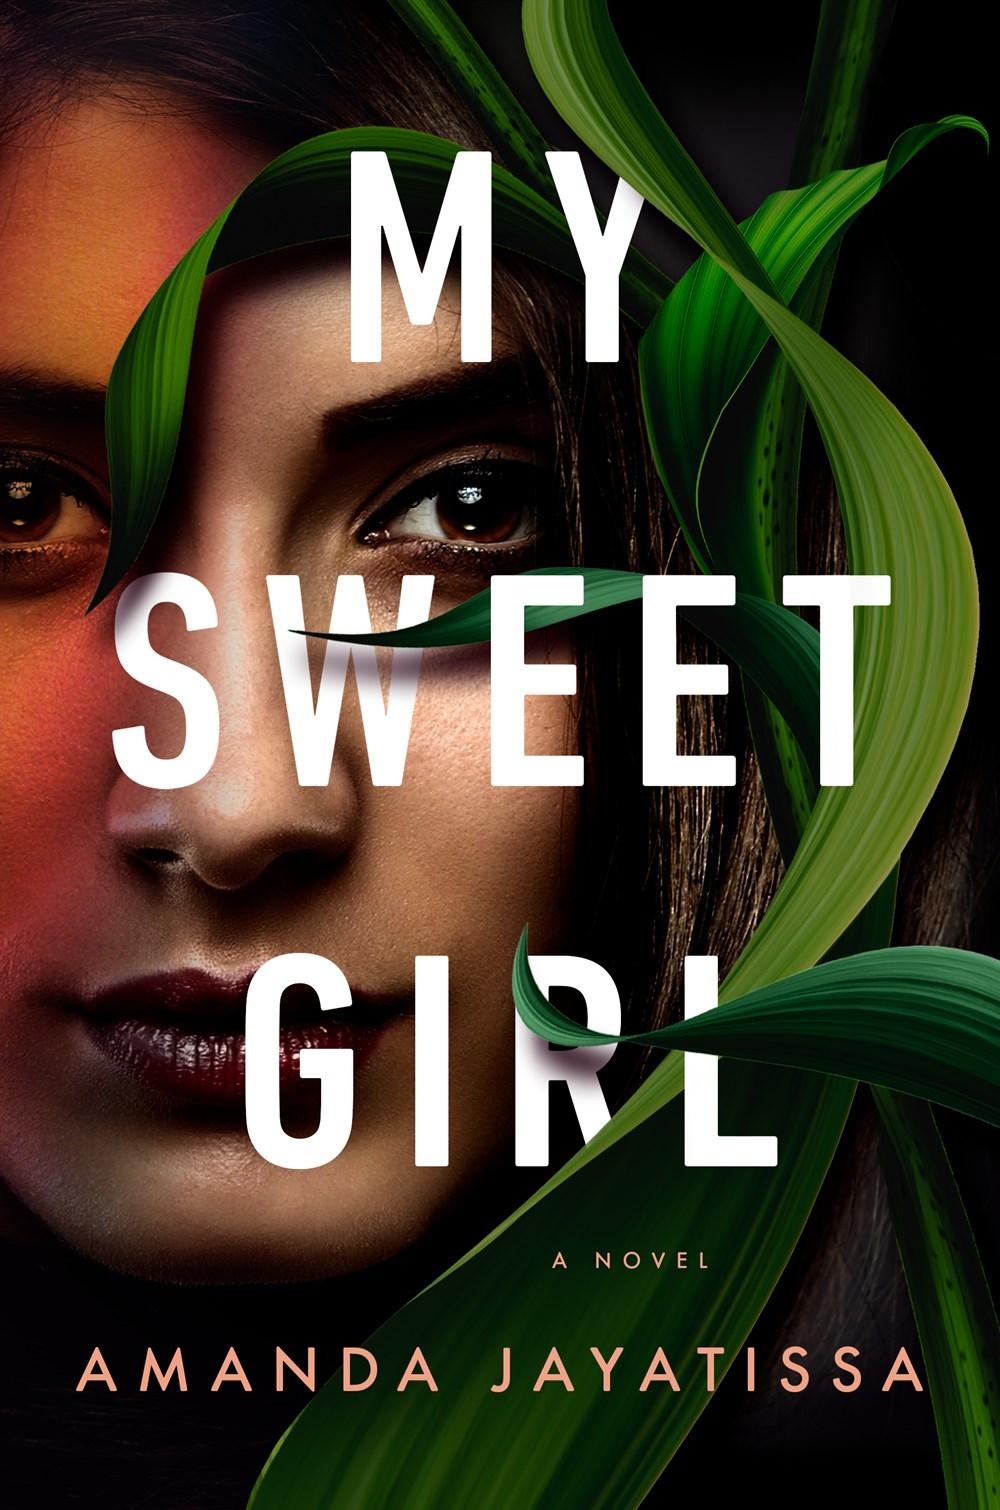 cover of My Sweet Girl by Amanda Jayatissa